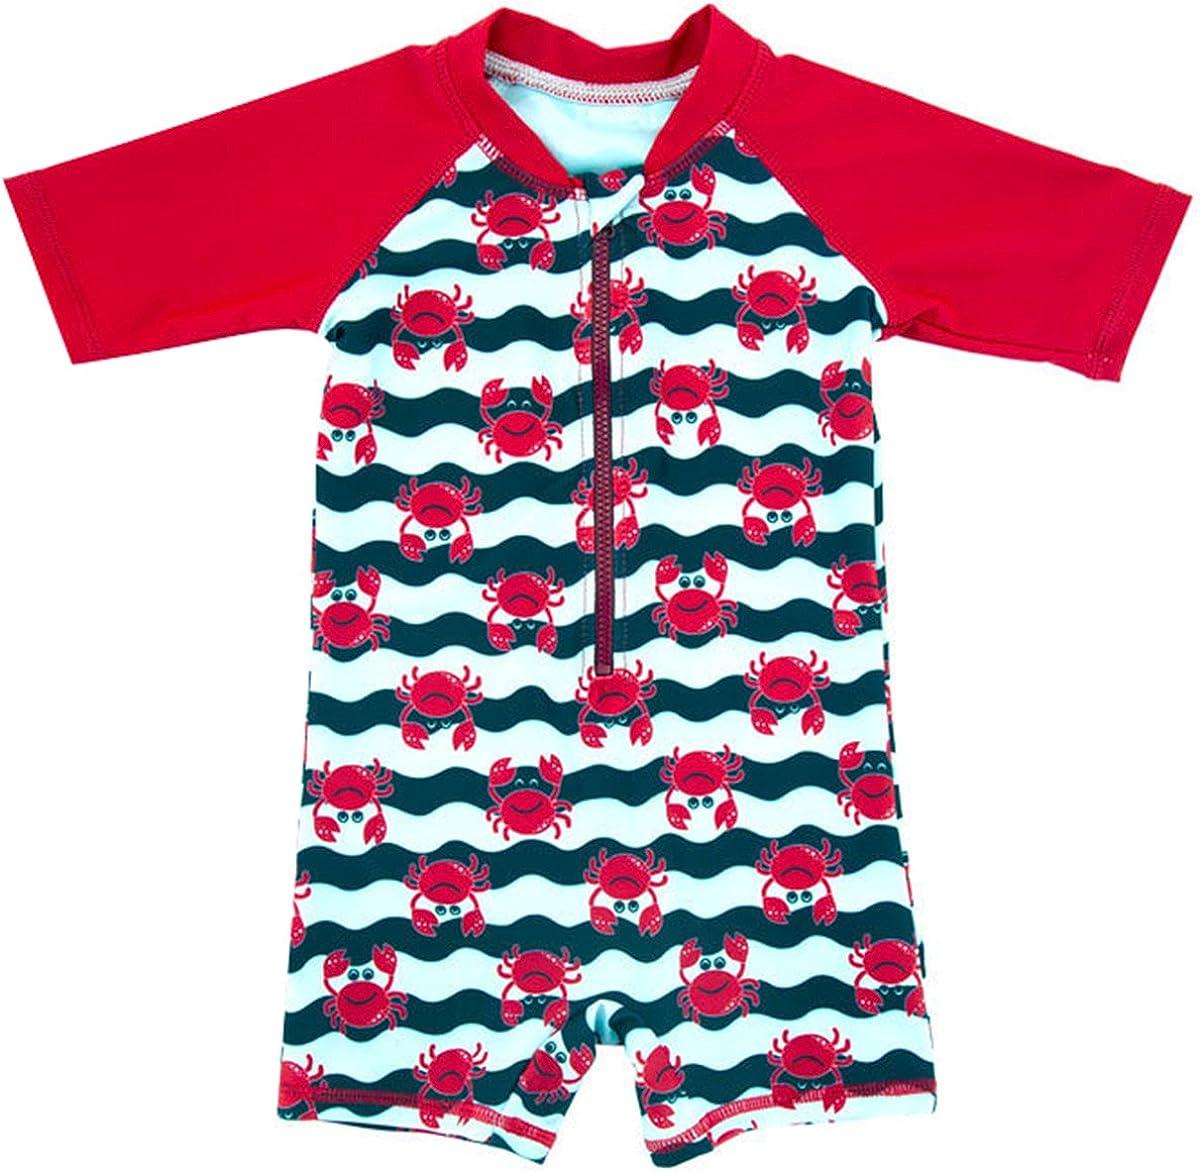 Bai You Mei Baby Toddler Boys Swim Set Kids Swimsuits Boys One Pieces UV Protective Swimwear Rash Guard